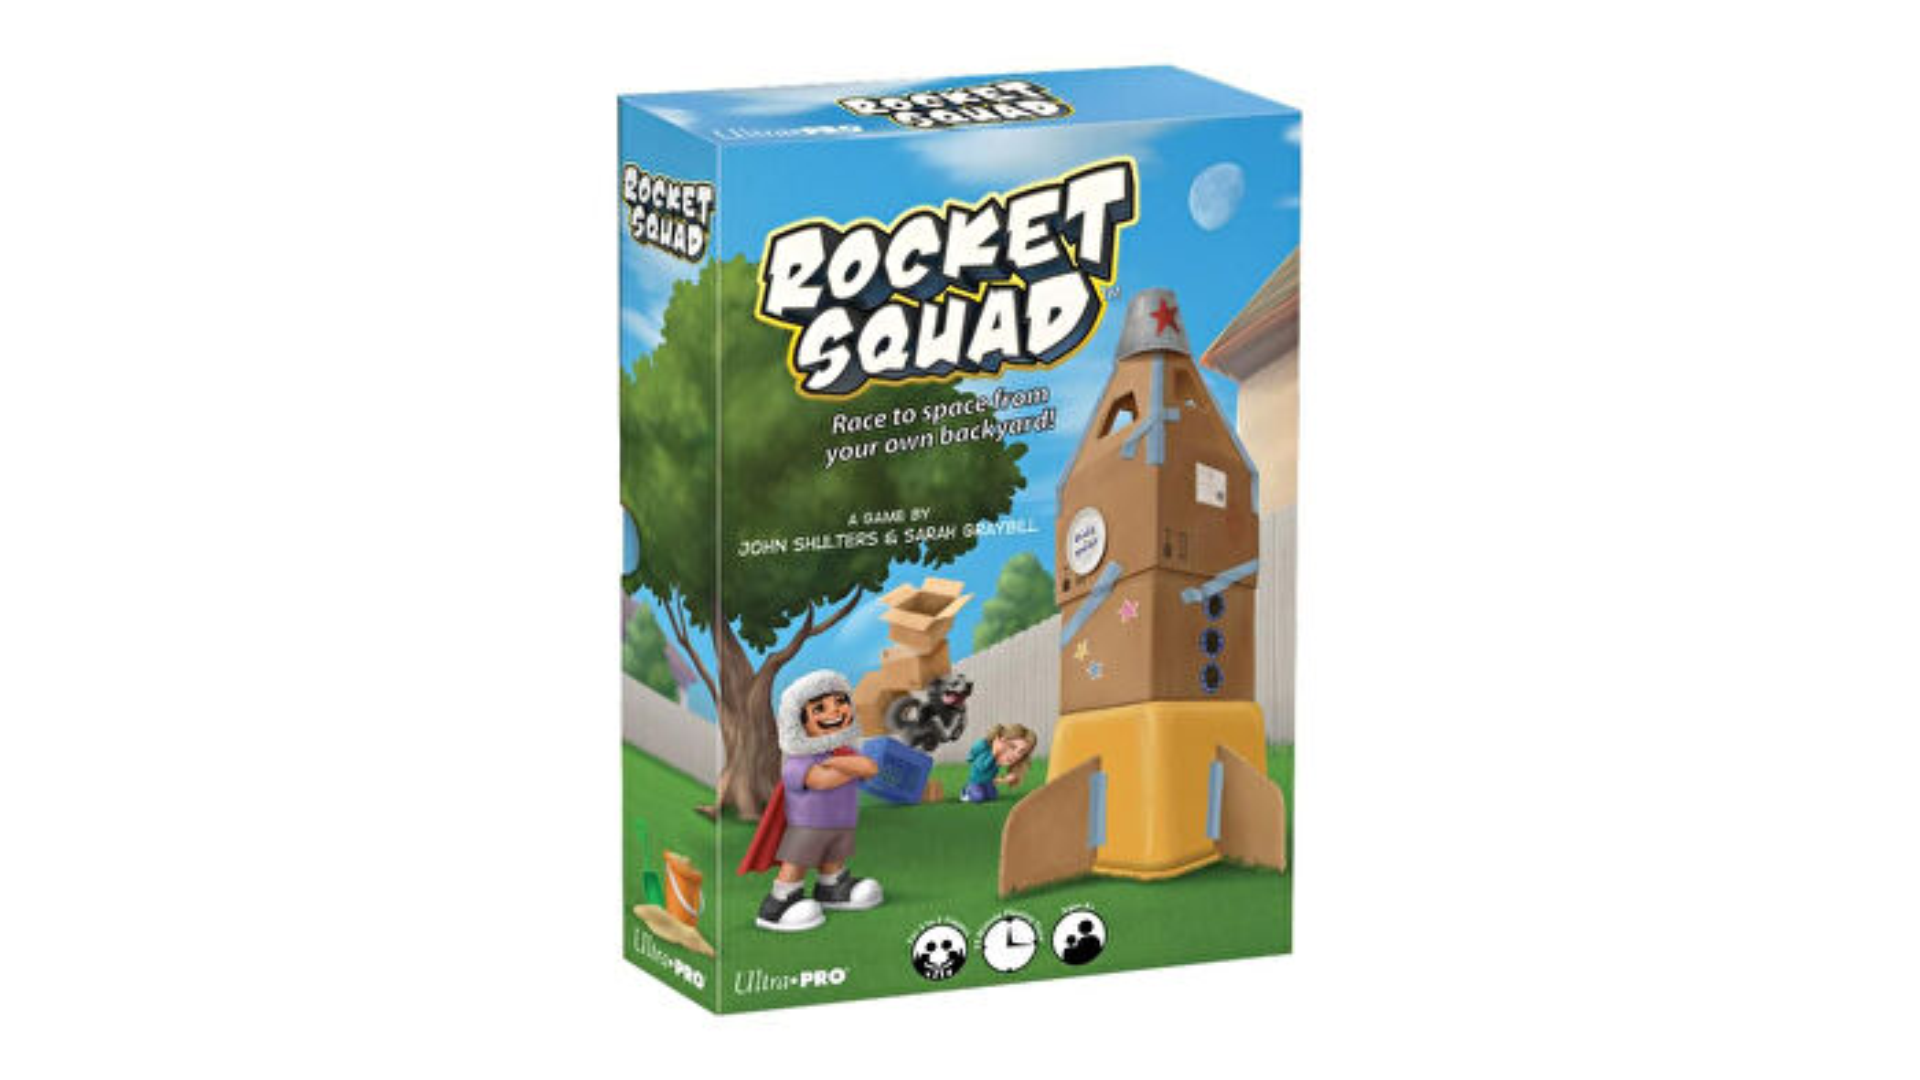 rocket-squad-board-game-box.jpg